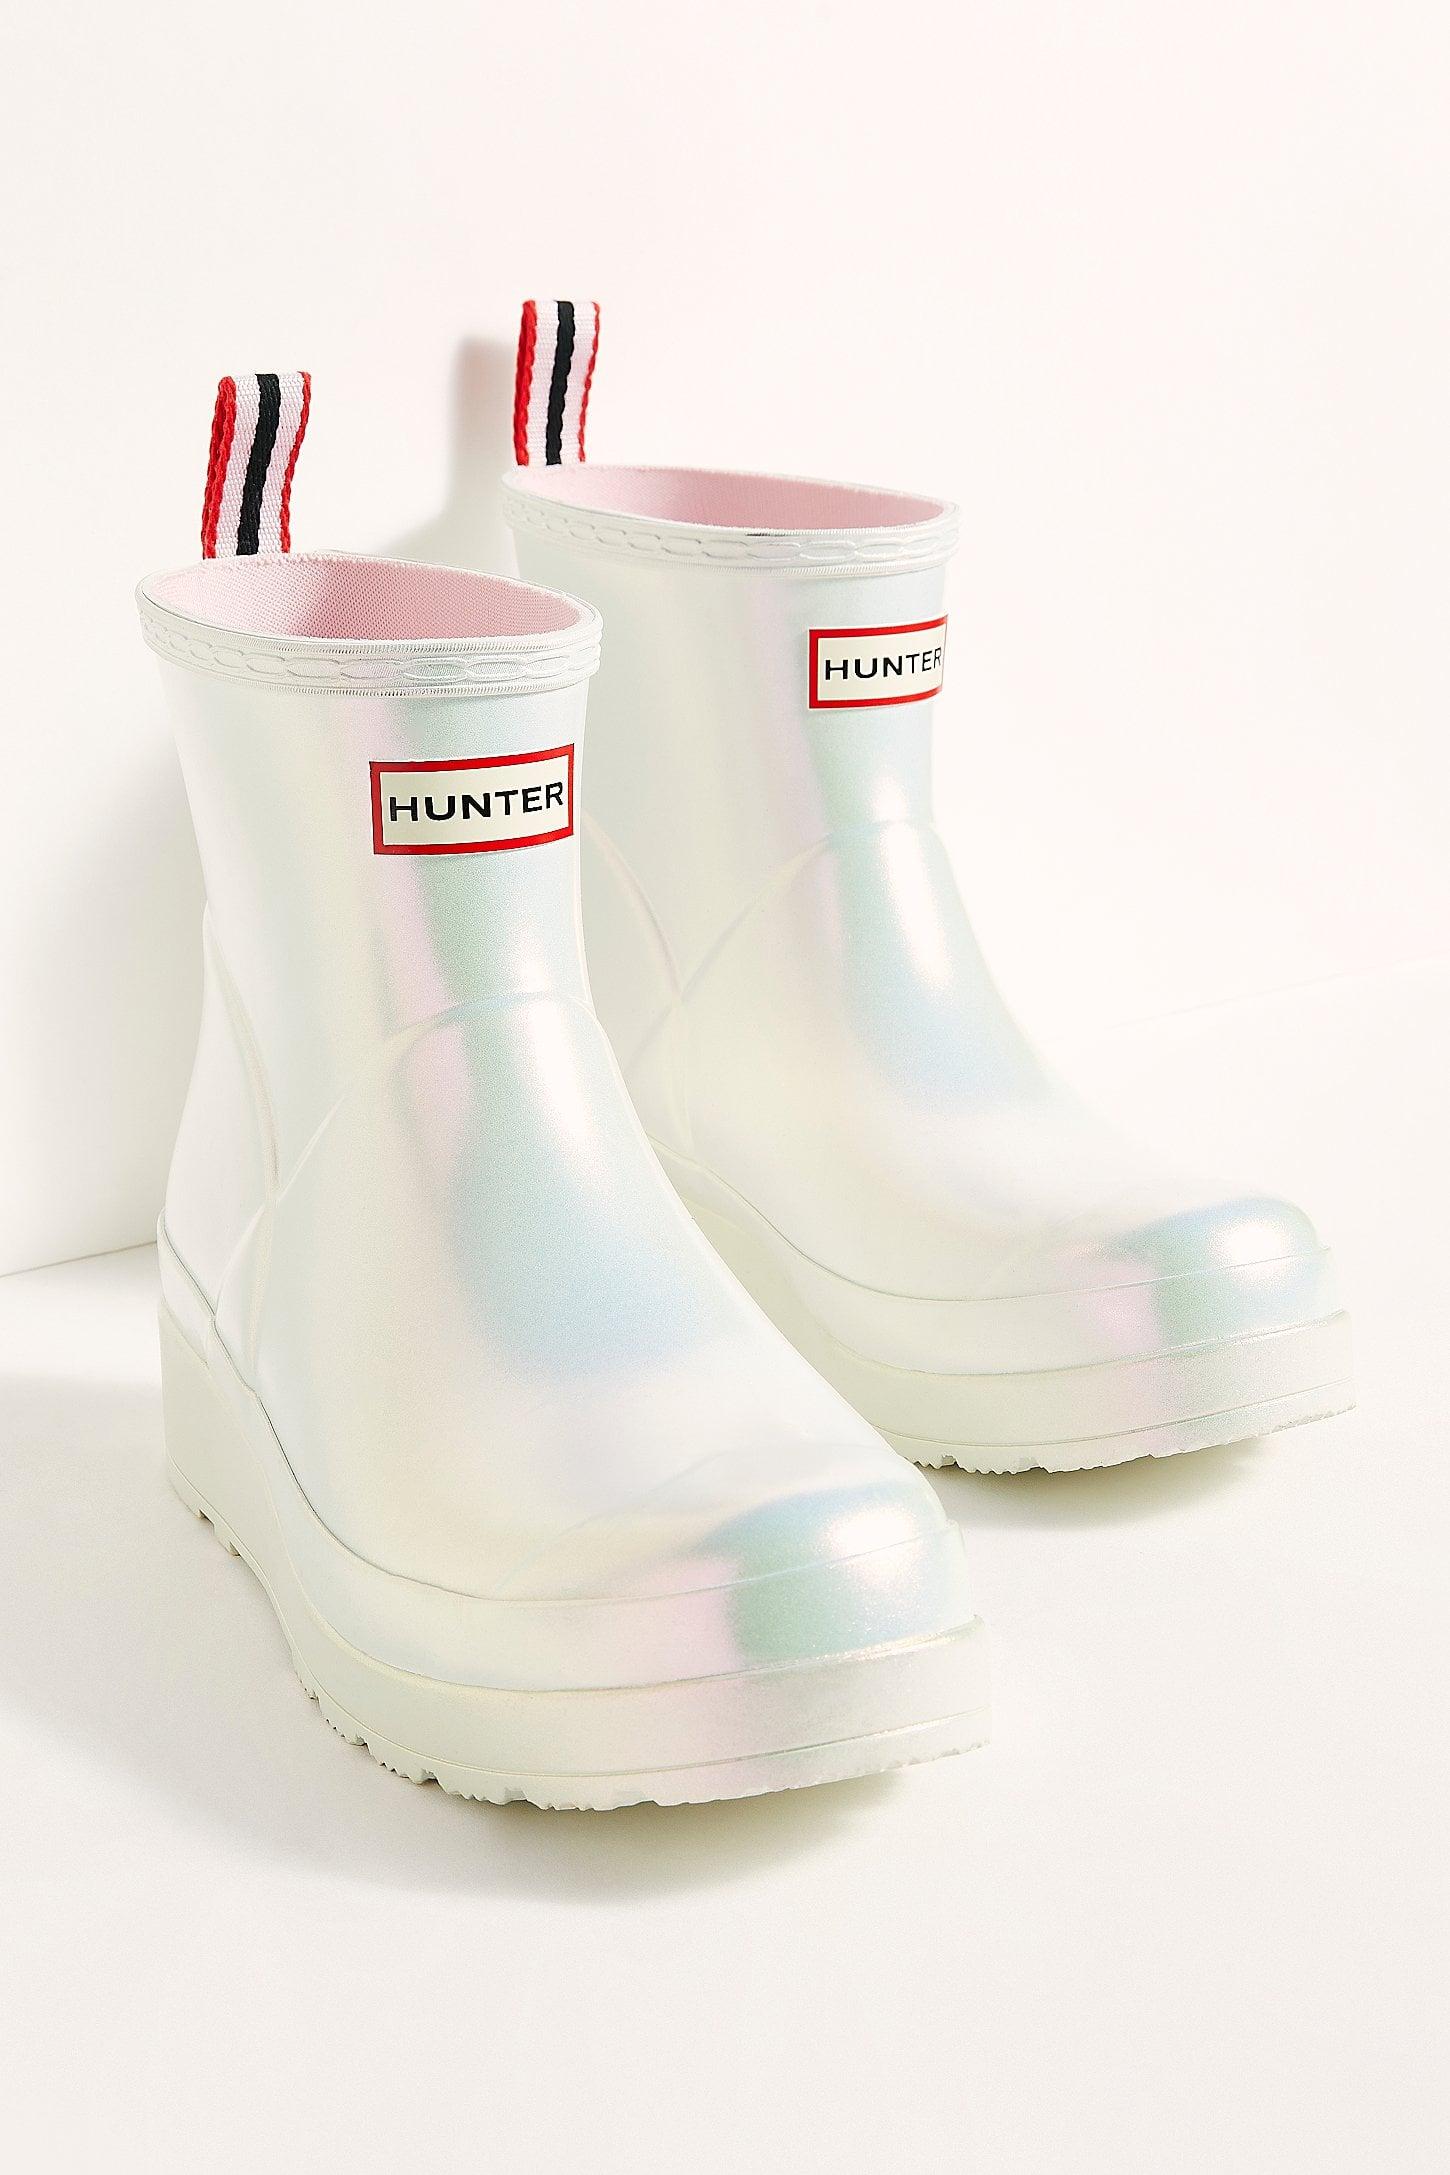 Popular Hunter Boots of 2020